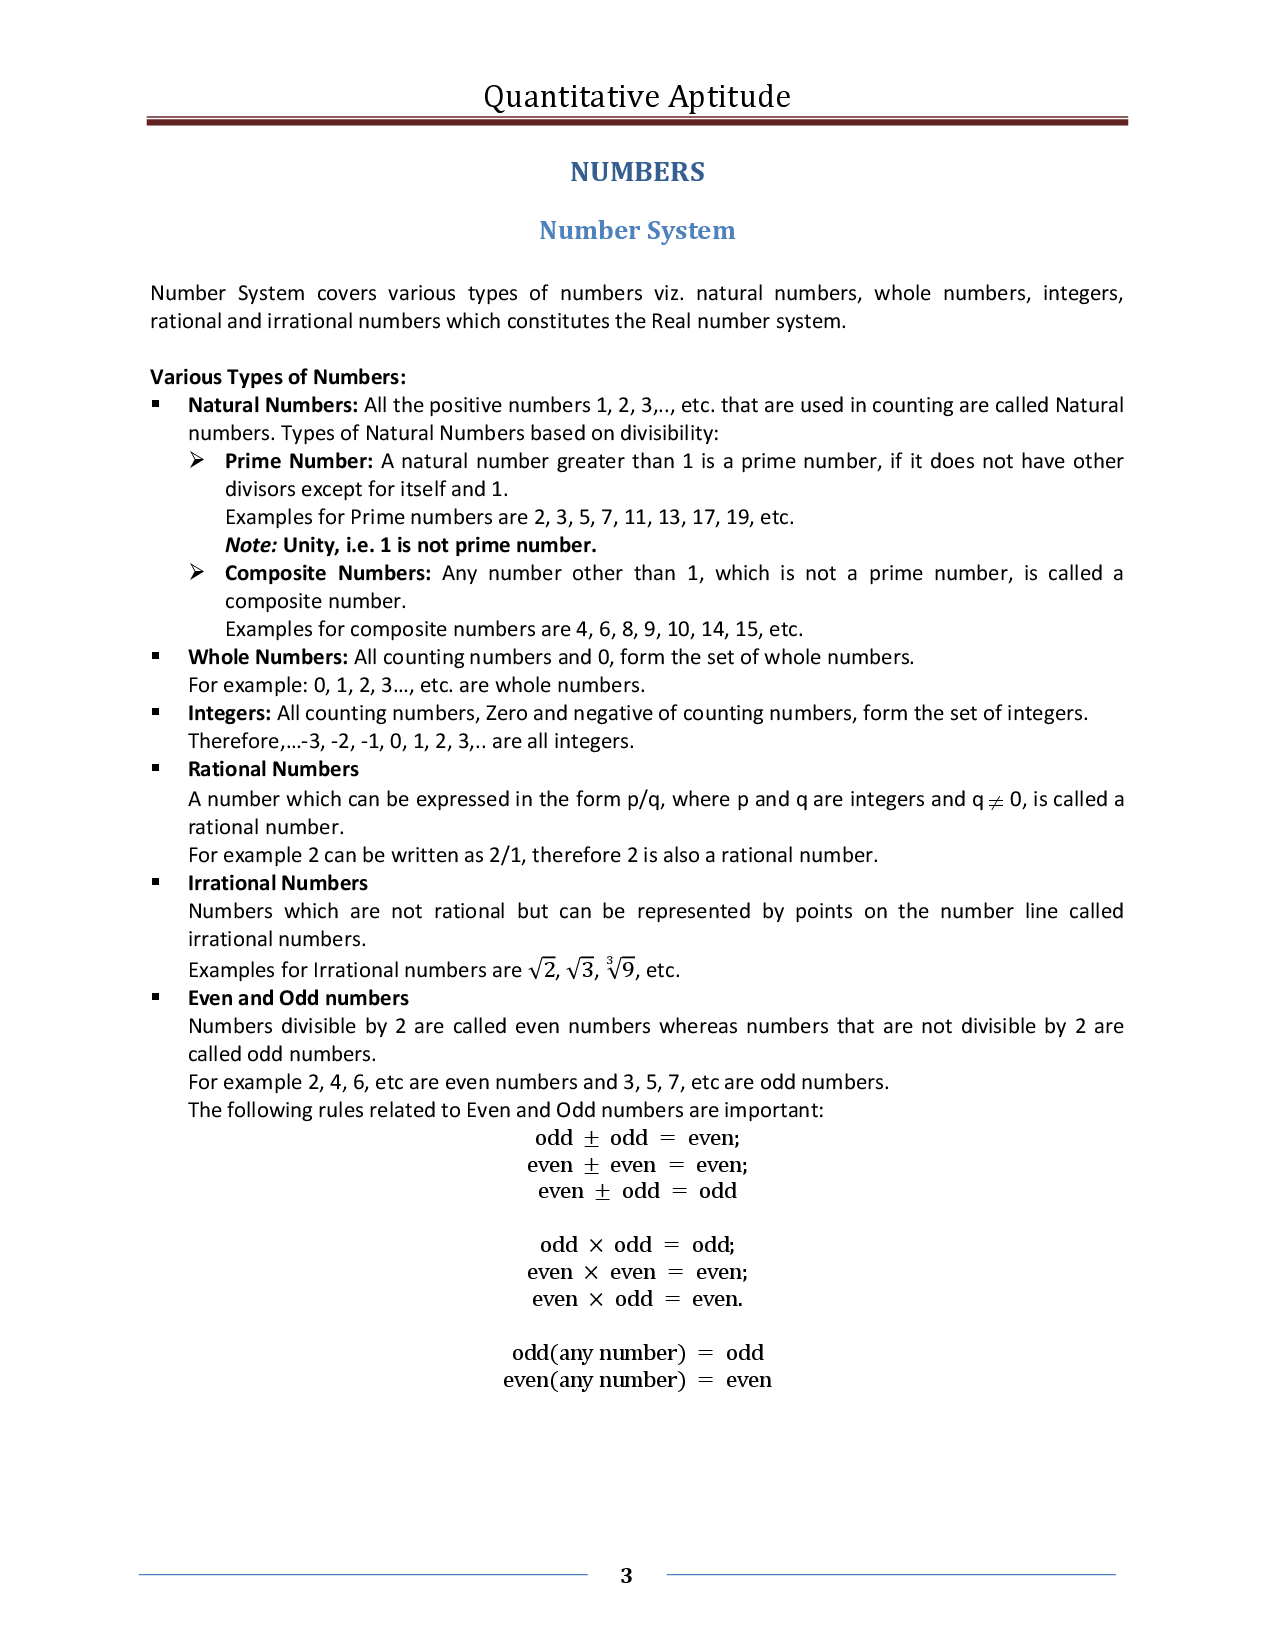 Quantitative Aptitude Formula ebook - Page 3